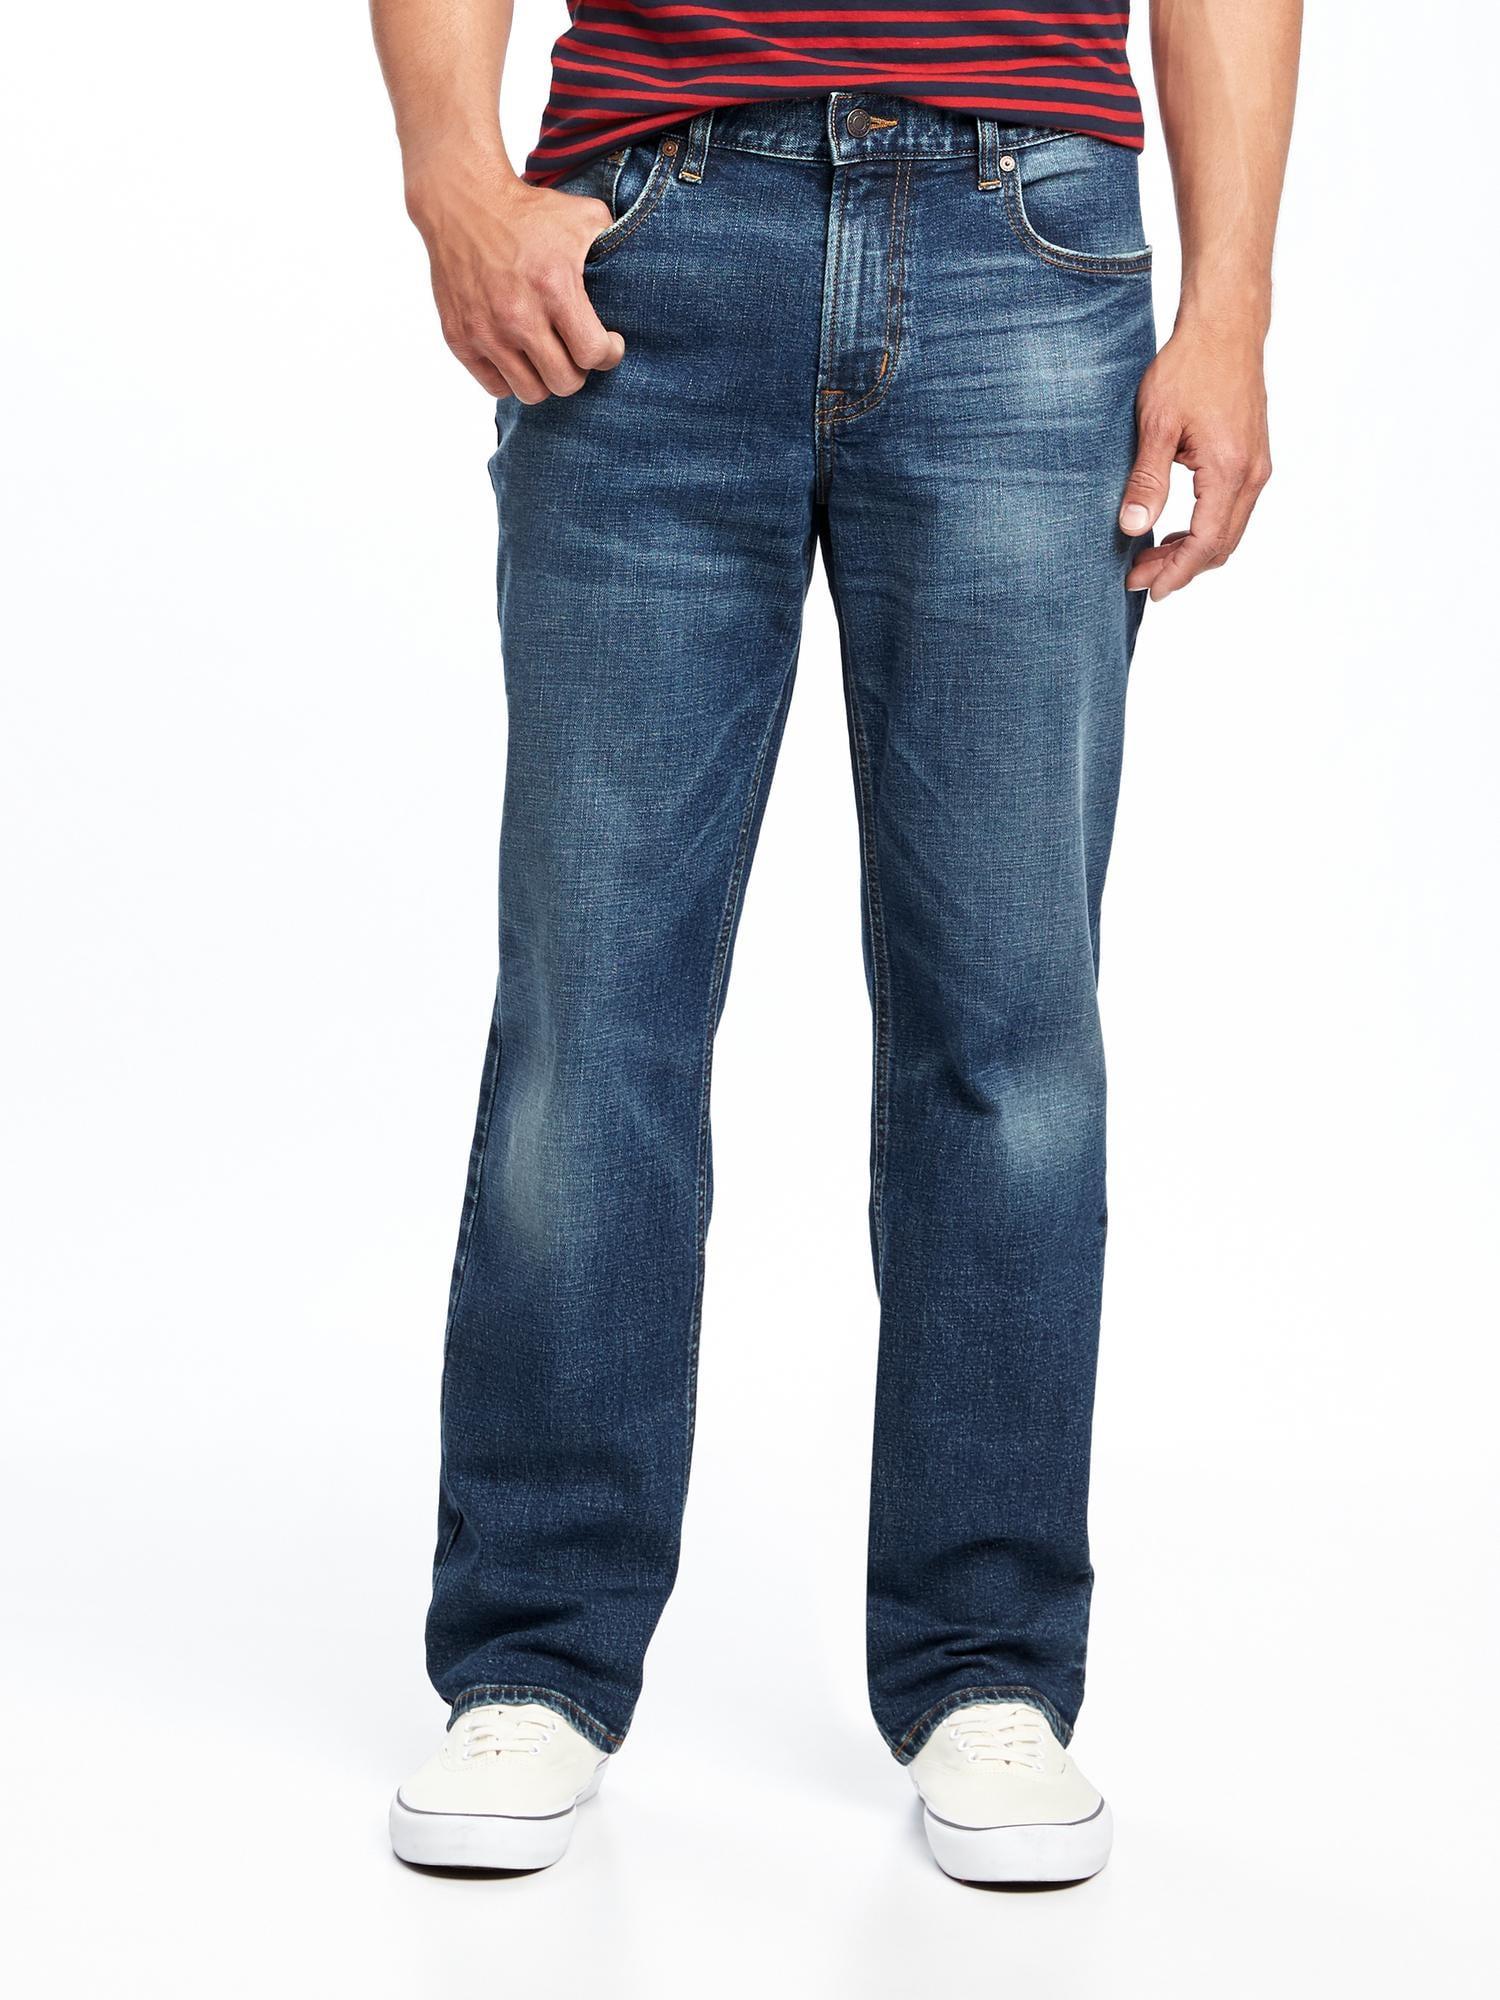 Big Star Jeans Mens Relaxed Fit Denim Light Blue